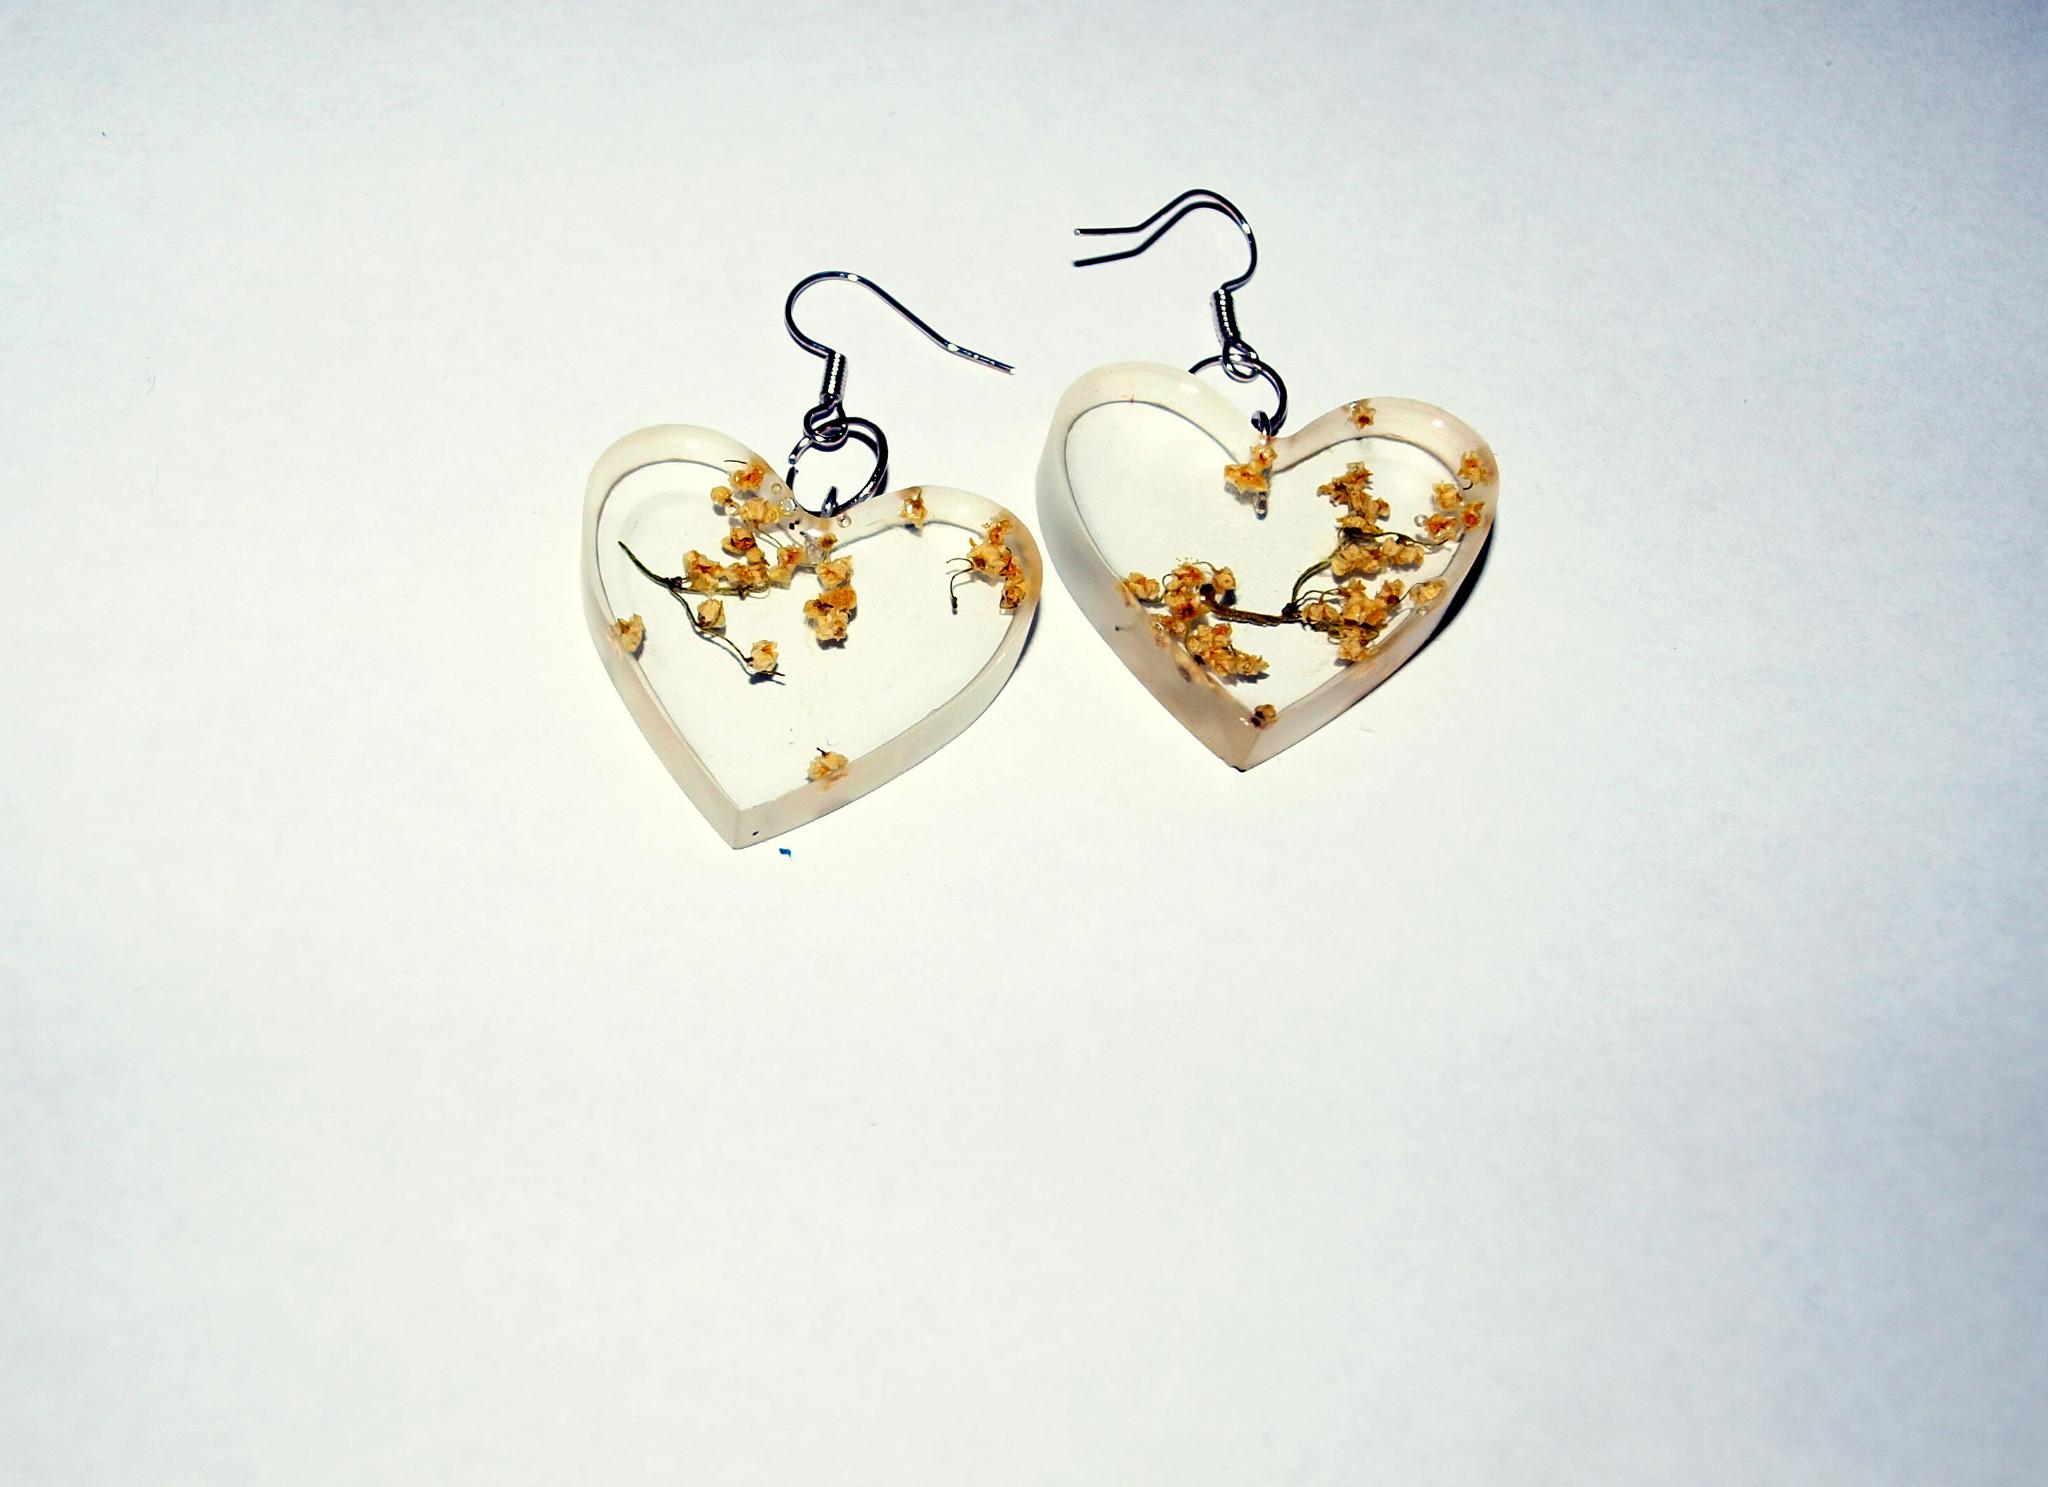 Handmade Heart Accessories